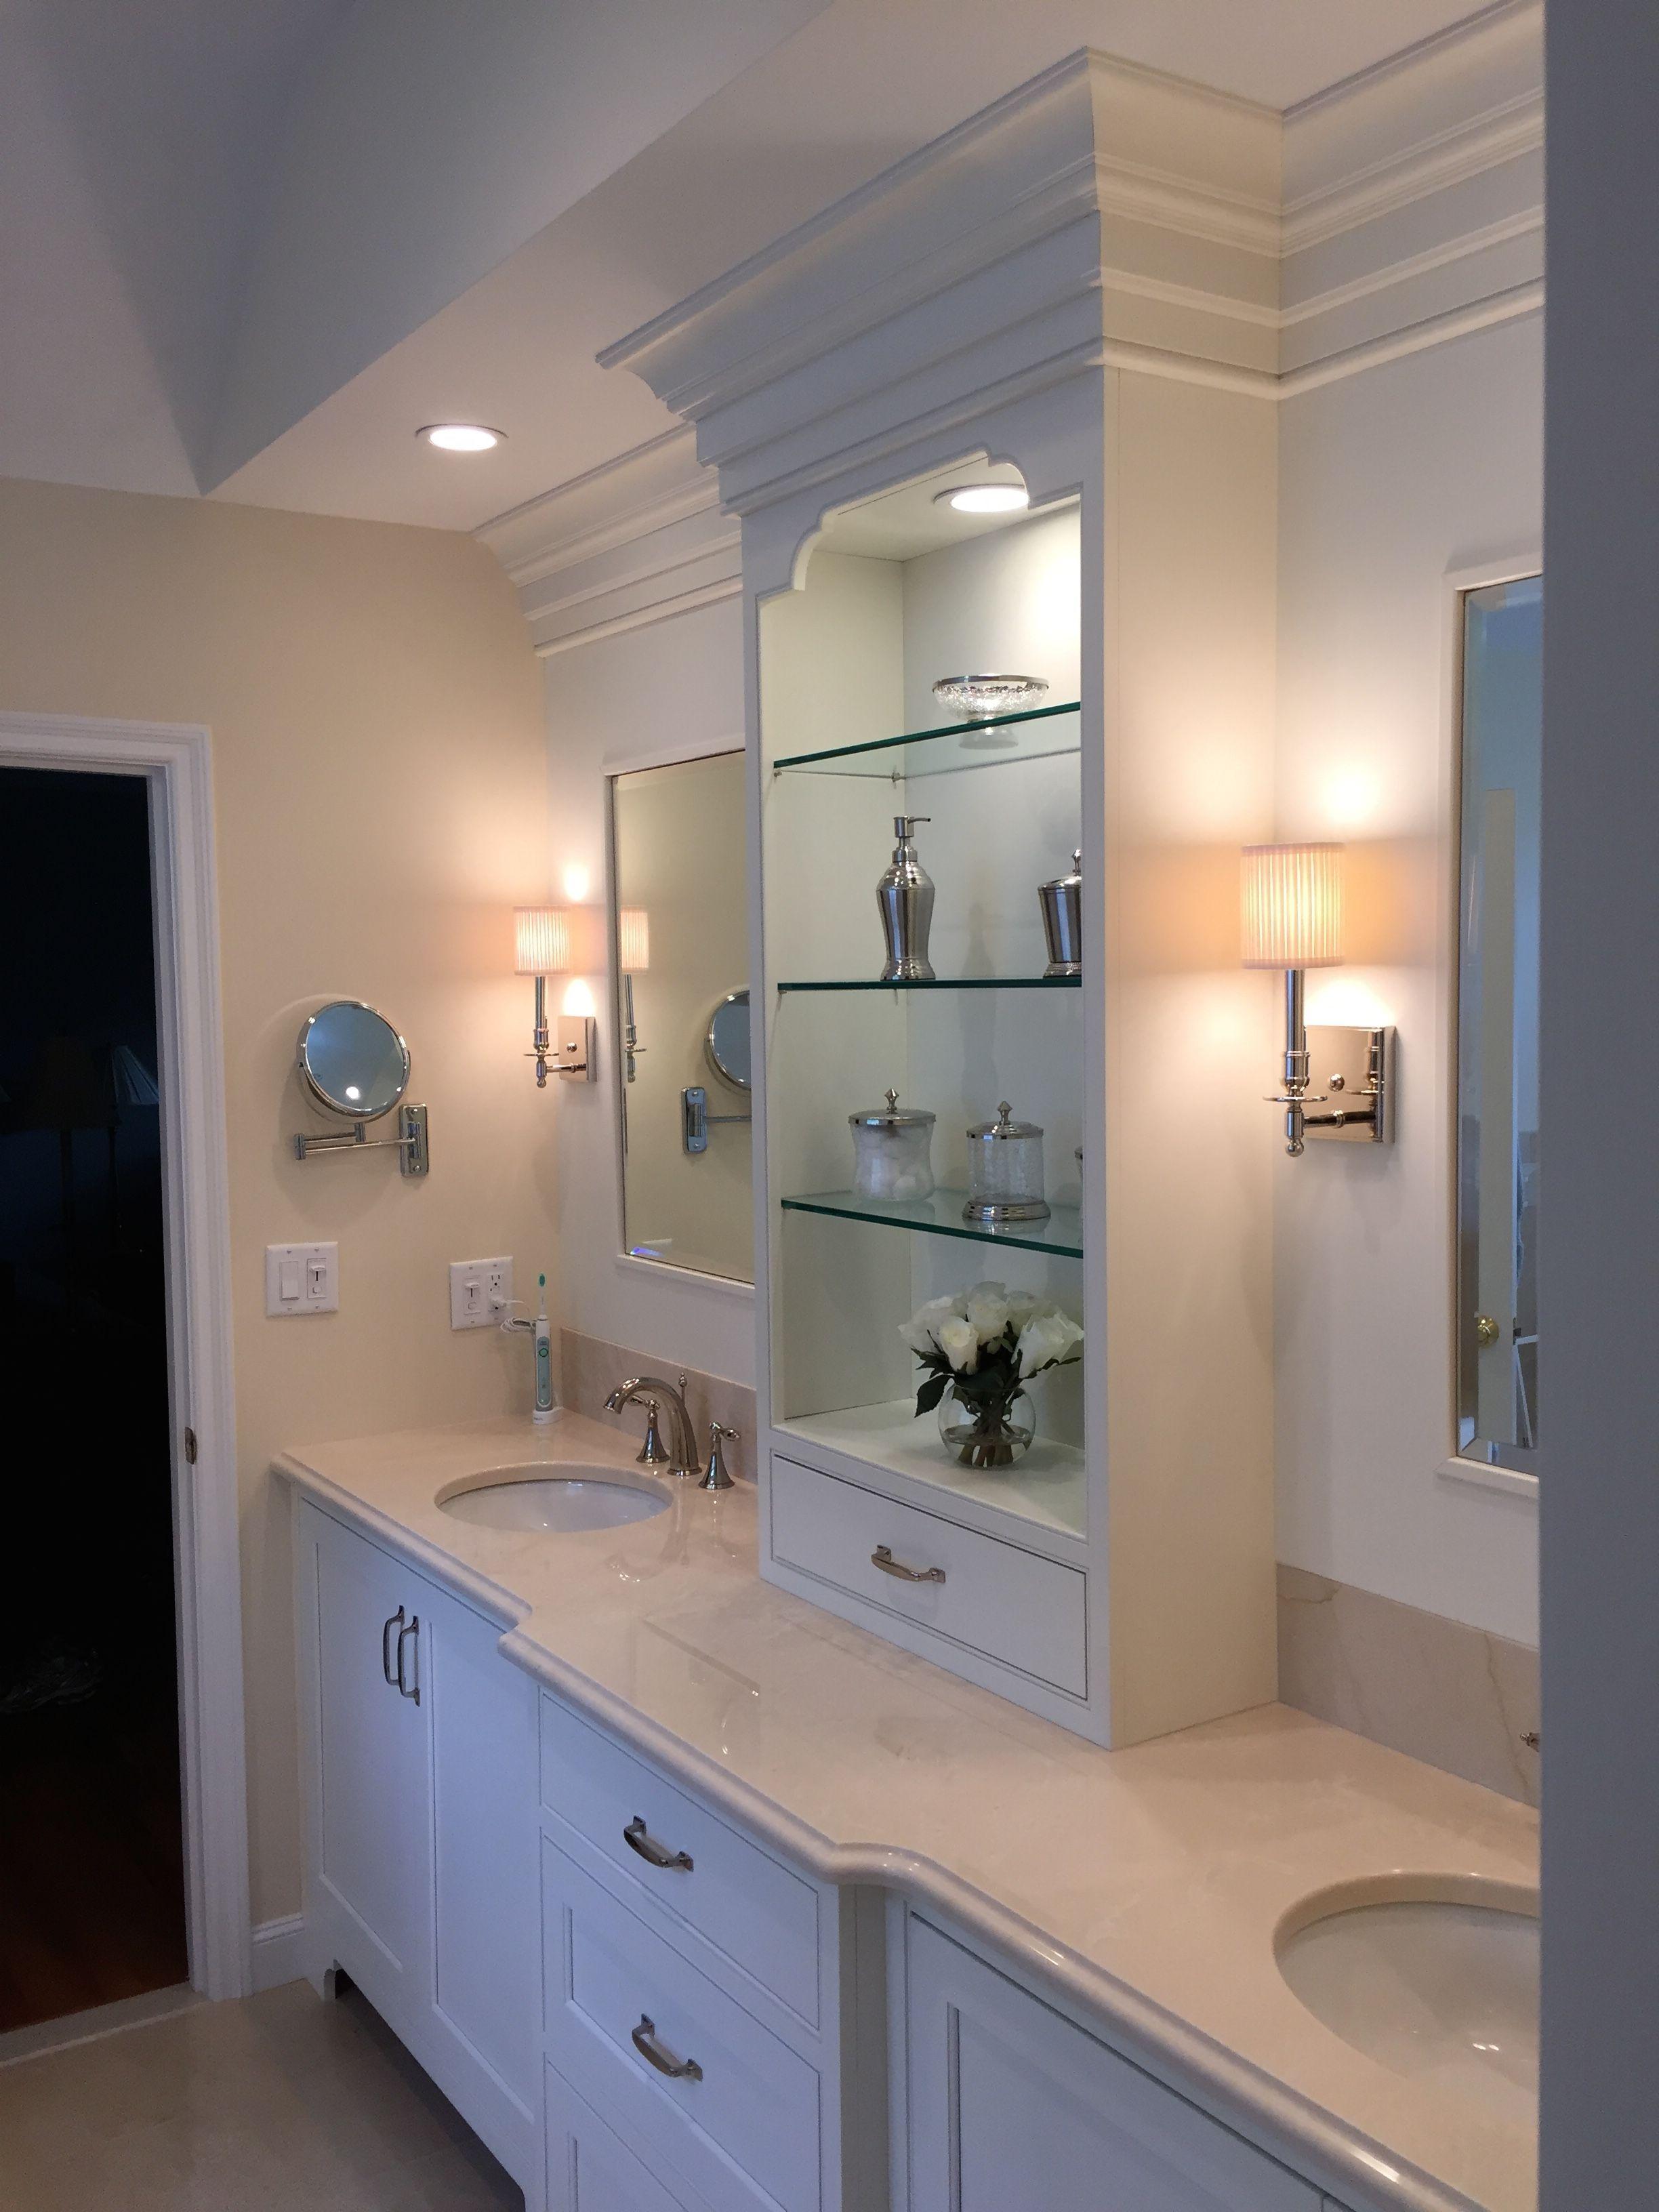 Medallion Cabinetry Santa Cruz Inset In Divinity White